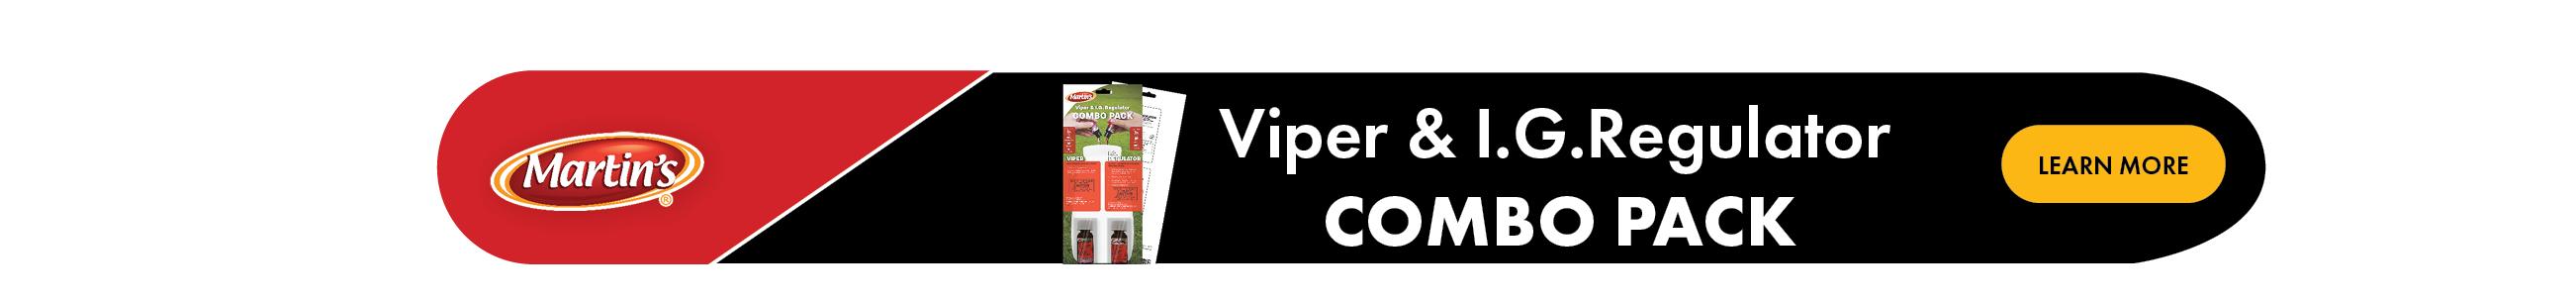 Viper IGR Combo